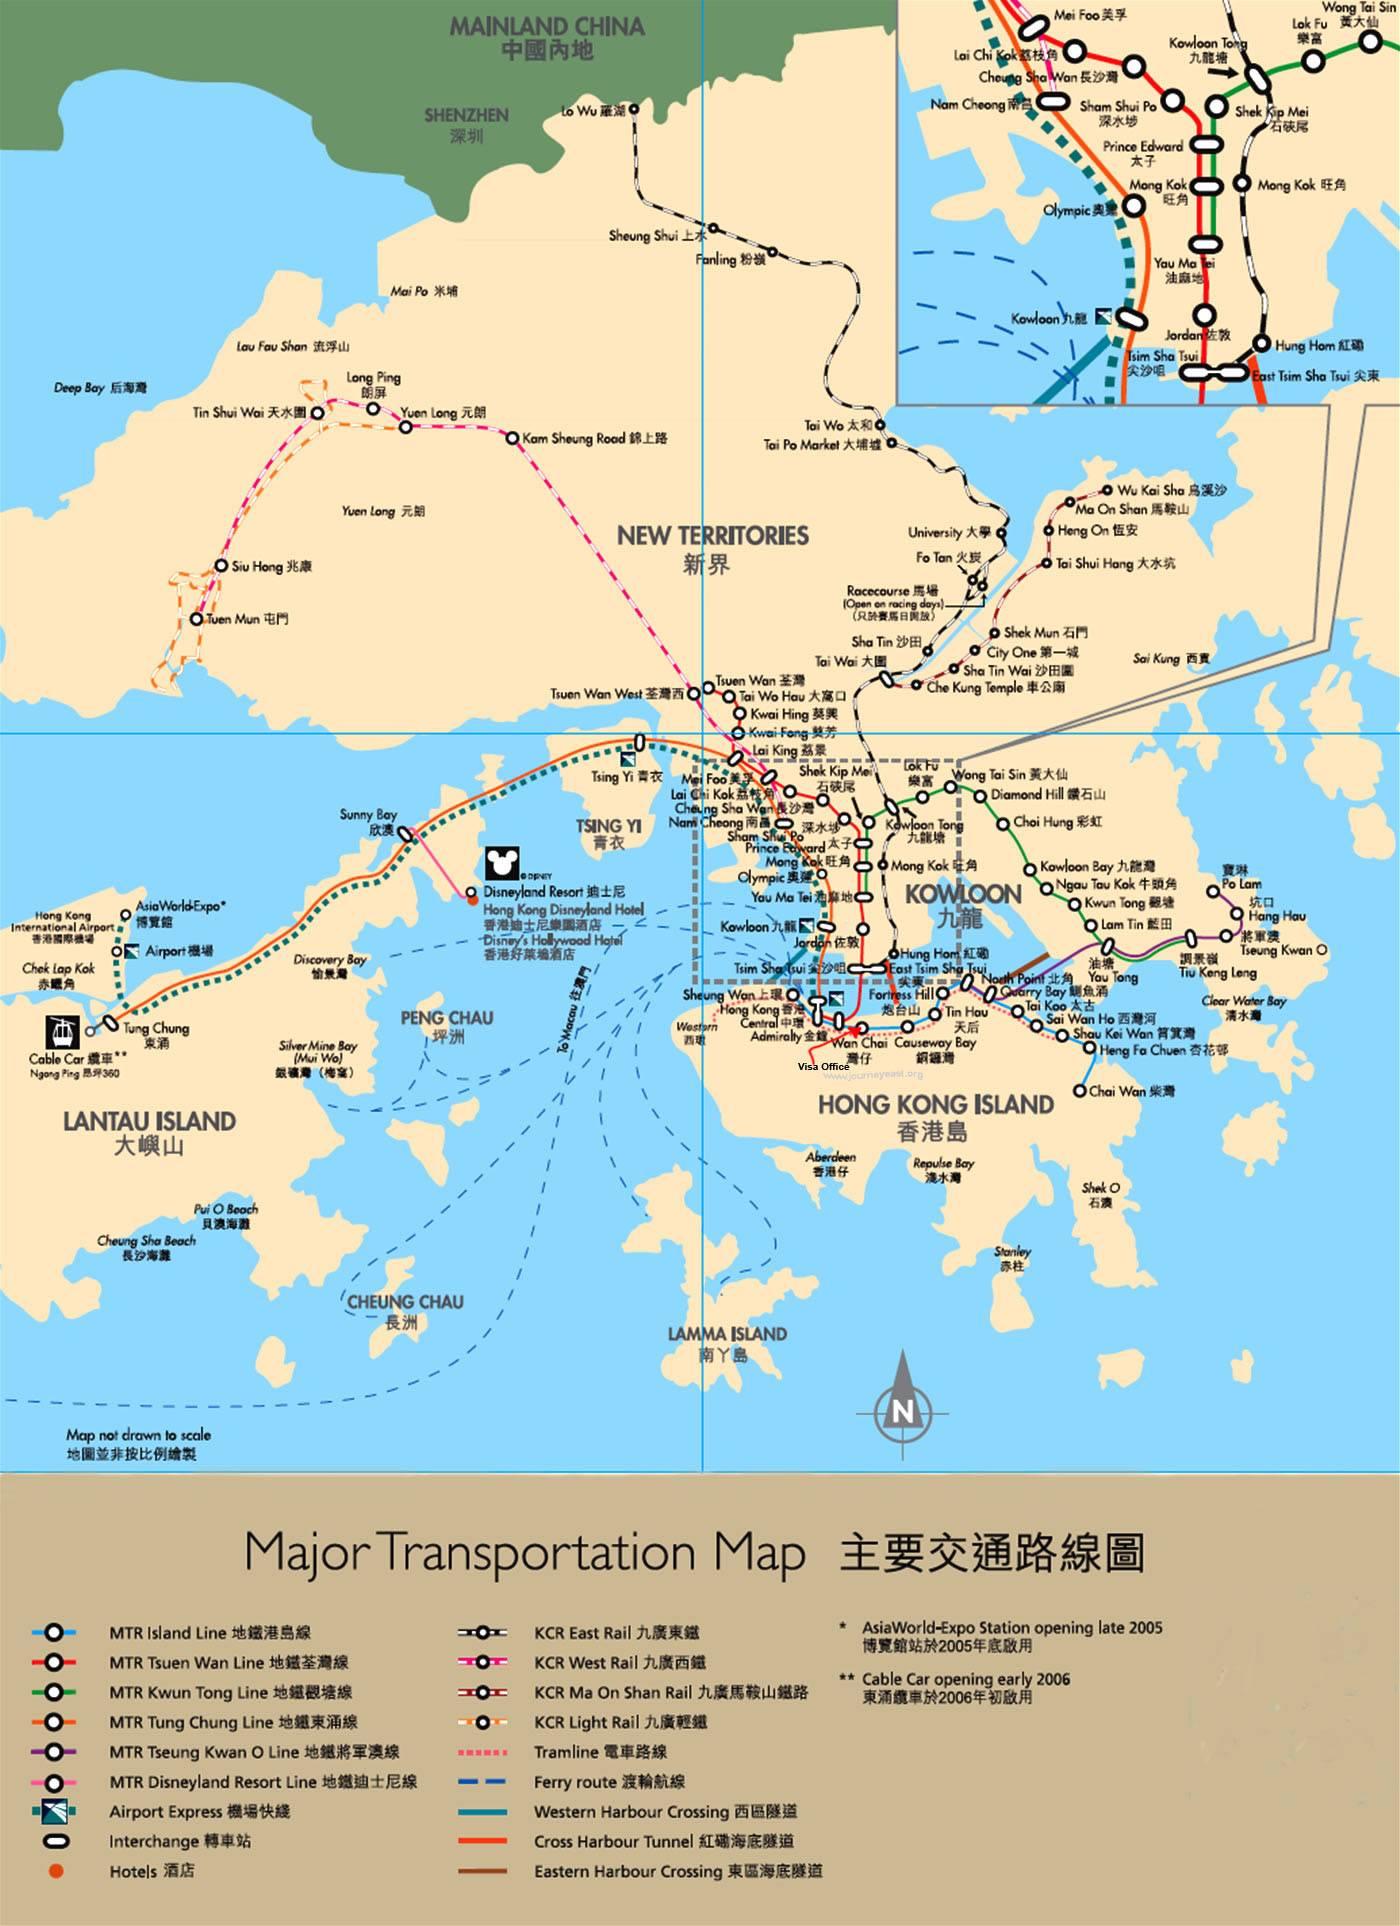 Hong Kong Subway Map Download.Downloadable Hong Kong Mtr Maps Plus Light Rail Tram China Mike